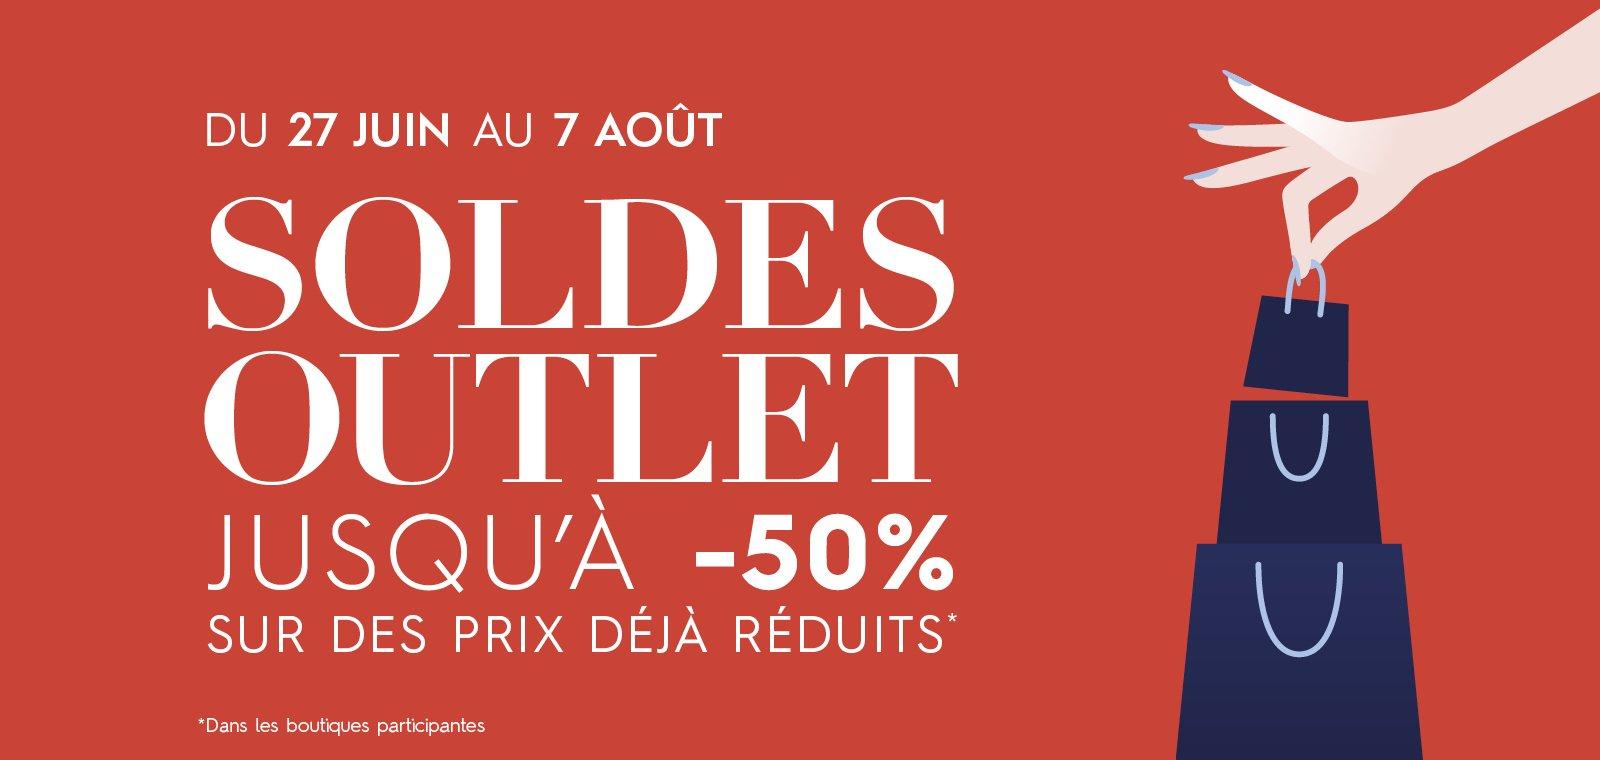 Summer Sales - Honfleur Normandy Outlet